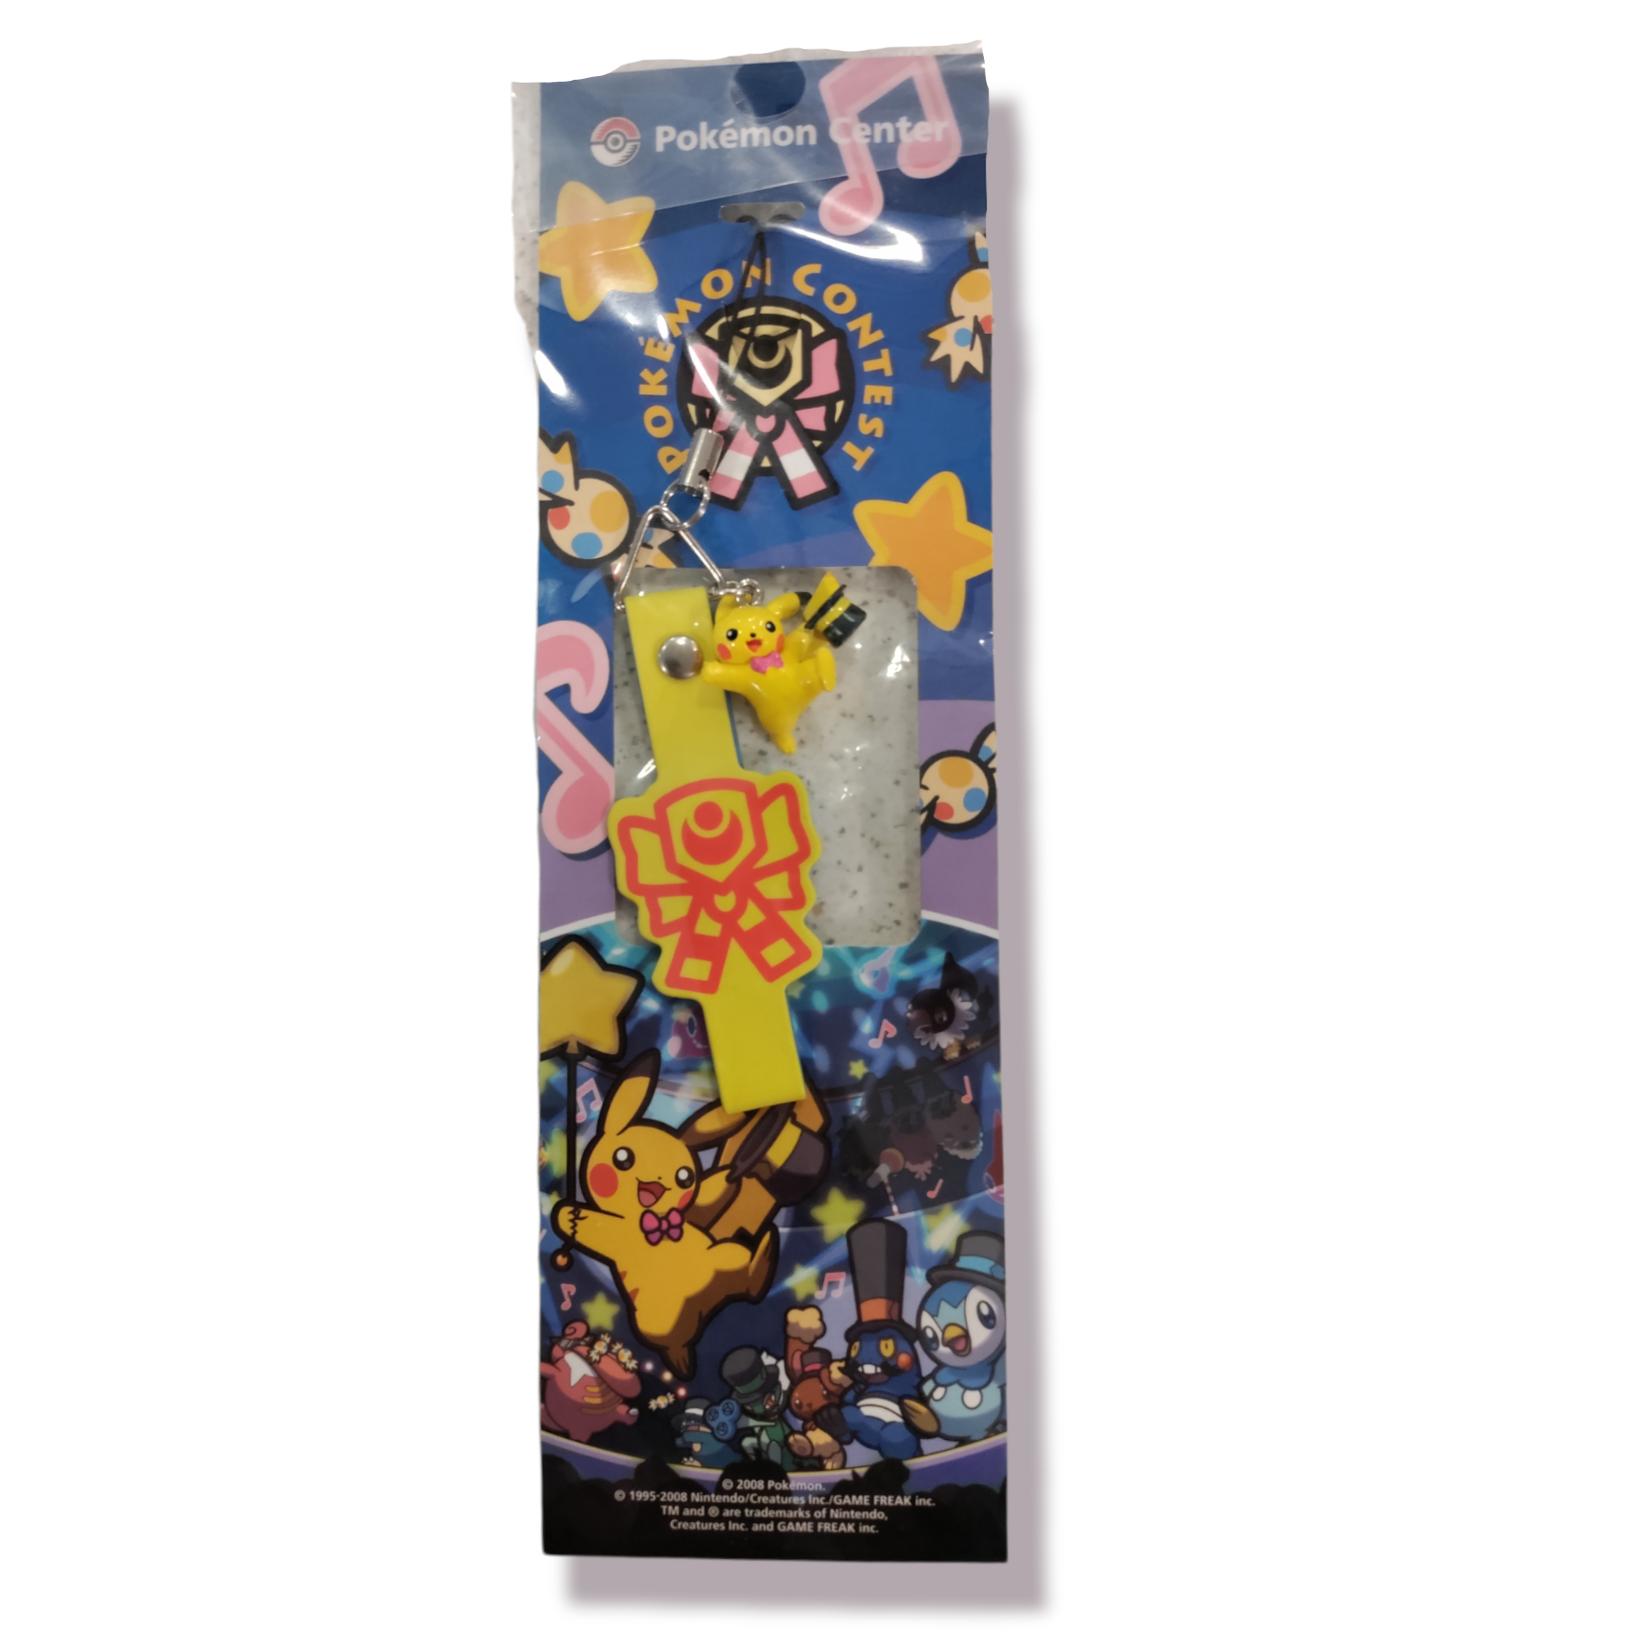 The Pokemon Company Pokemon center - Pikachu phone strap